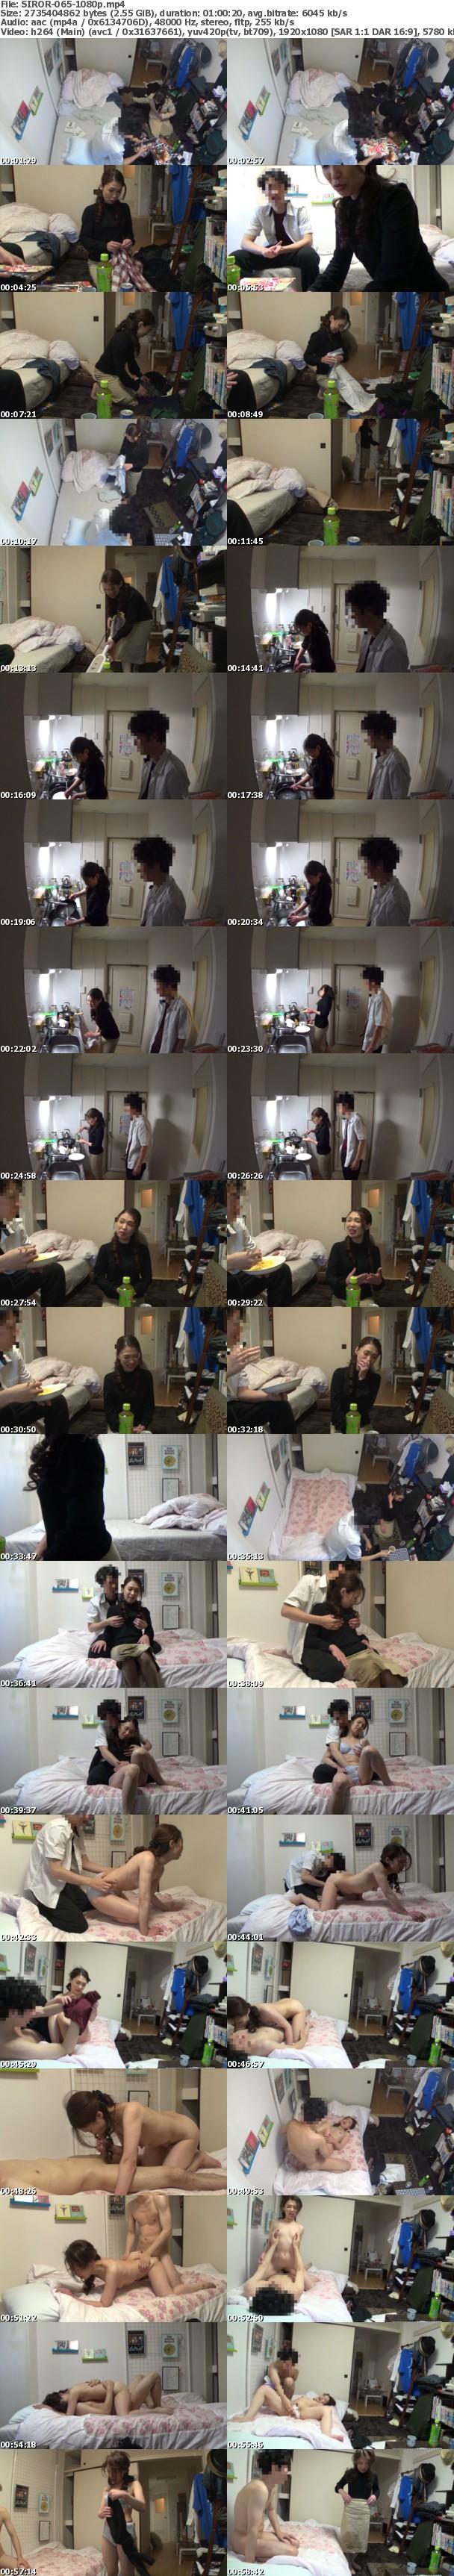 (Full HD) SIROR-065 レンタル熟女のお仕事~夫の知らない妻の裏の顔 file NO.65~